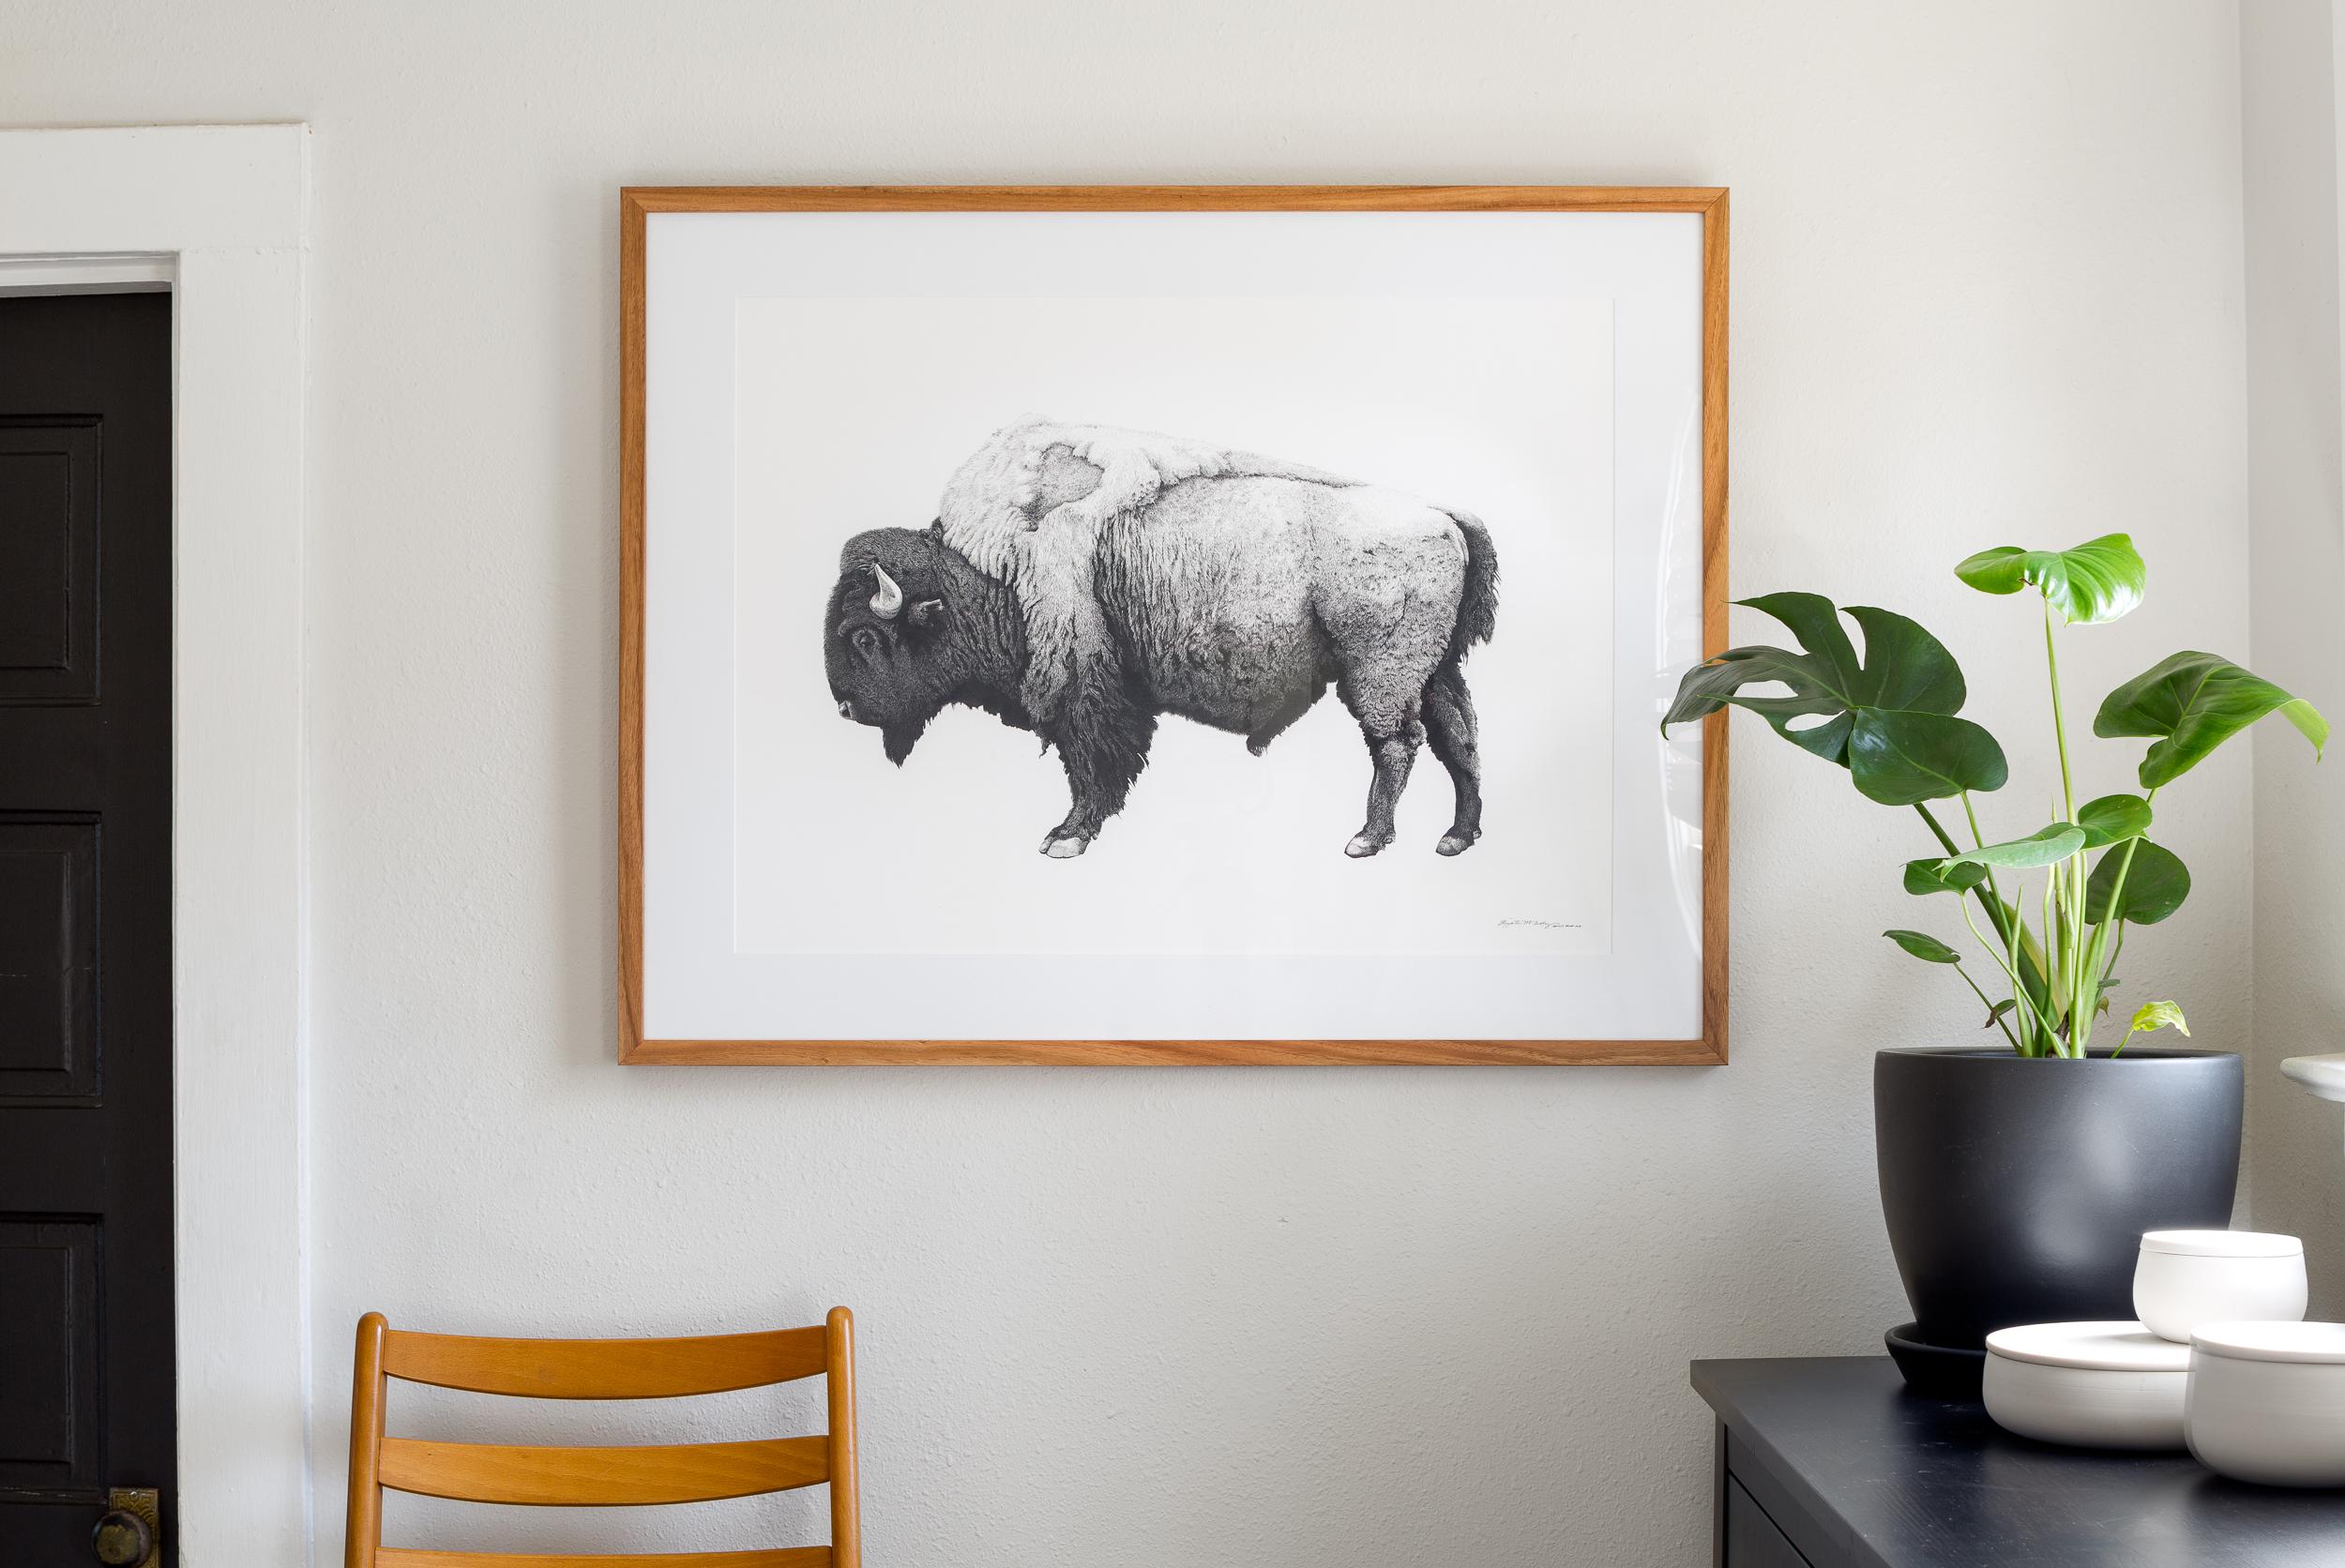 01-Buffalo-JoshPartee-9206.jpg